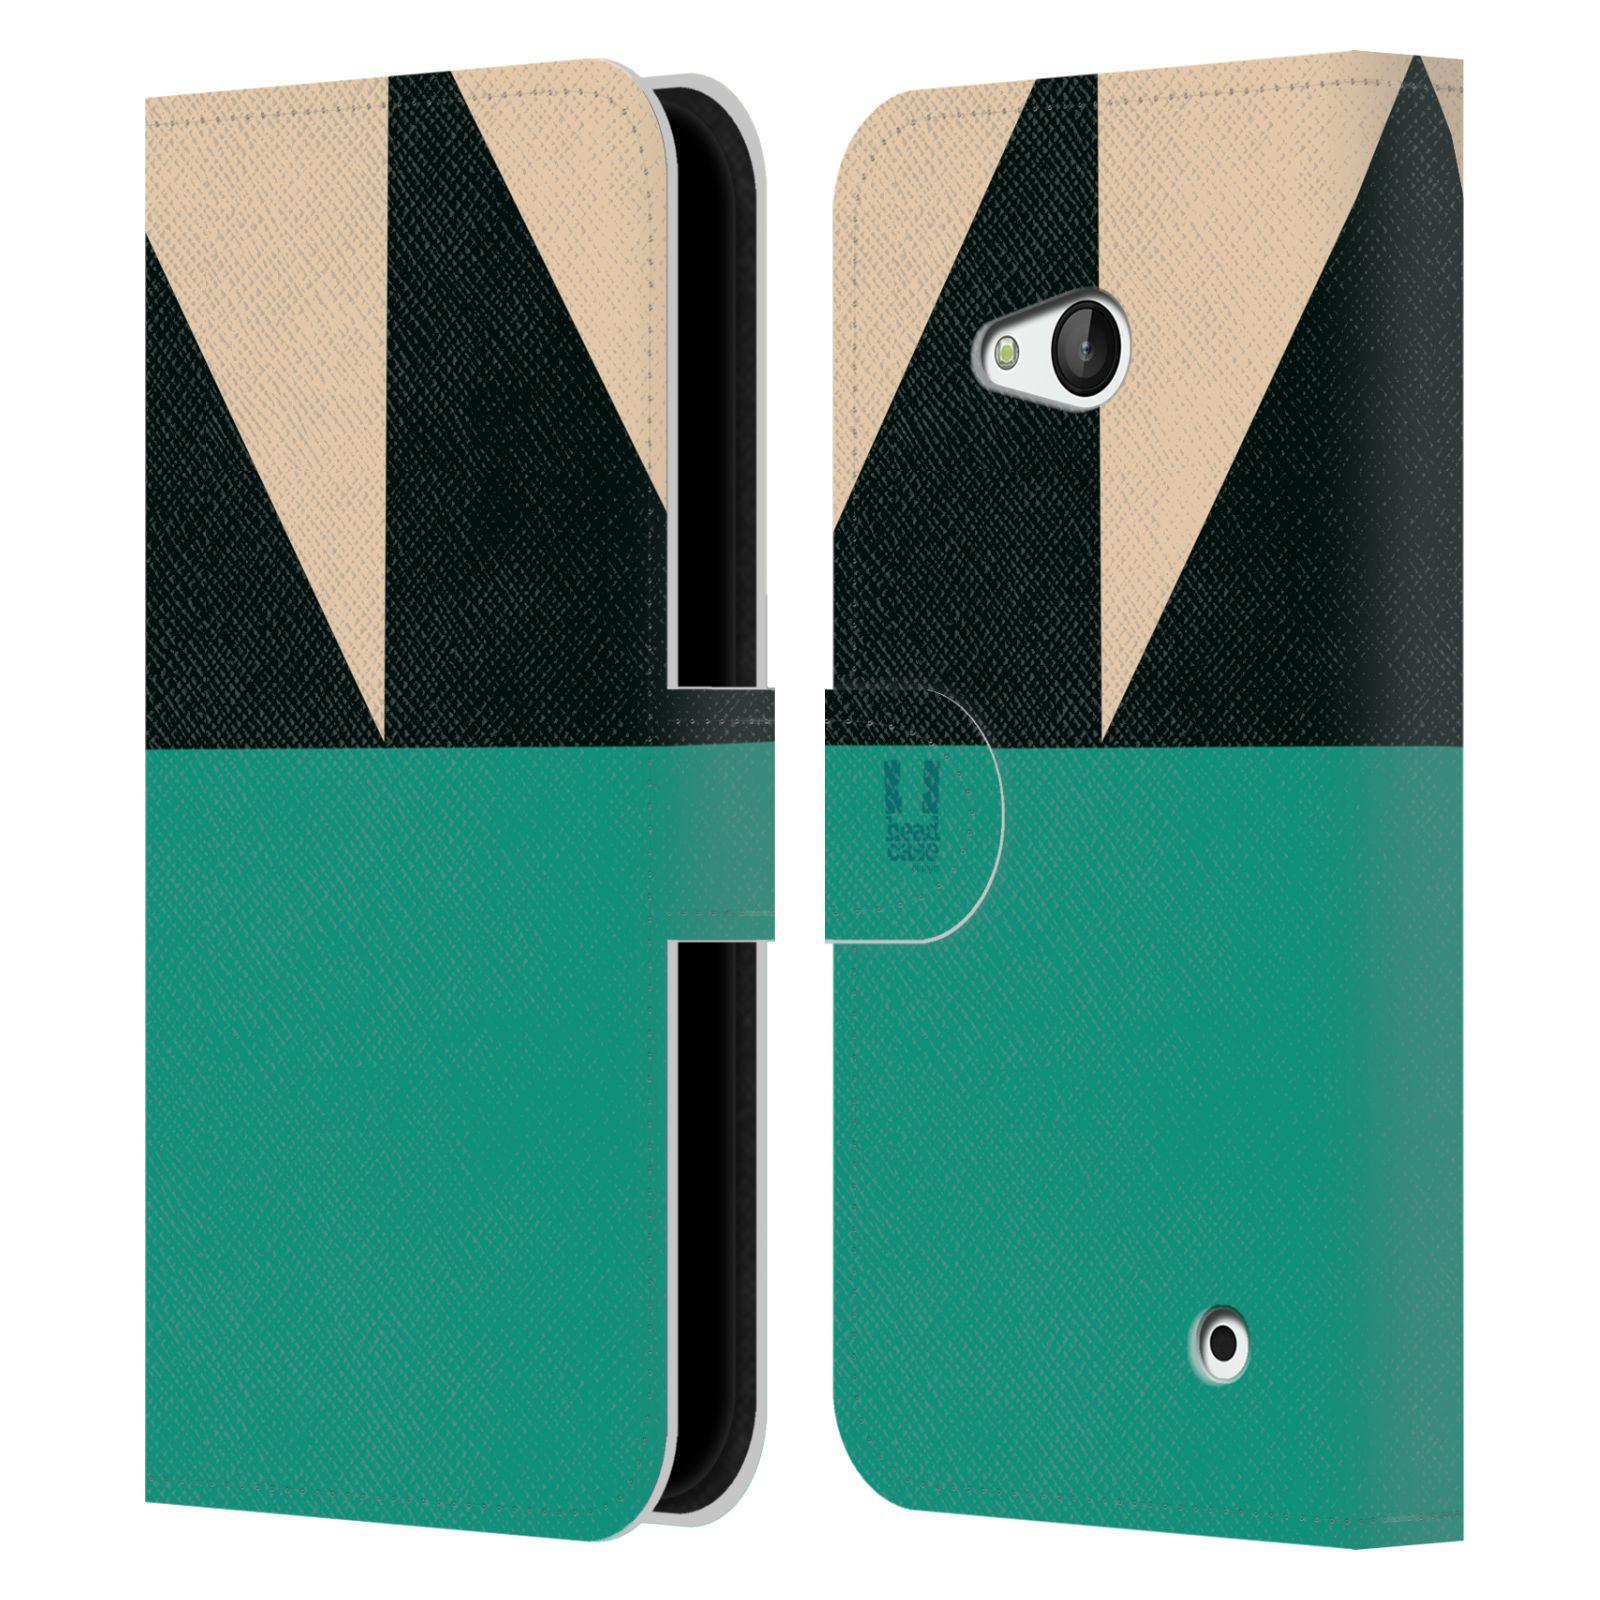 HEAD CASE Flipové pouzdro pro mobil Nokia LUMIA 640 barevné tvary moře modrá